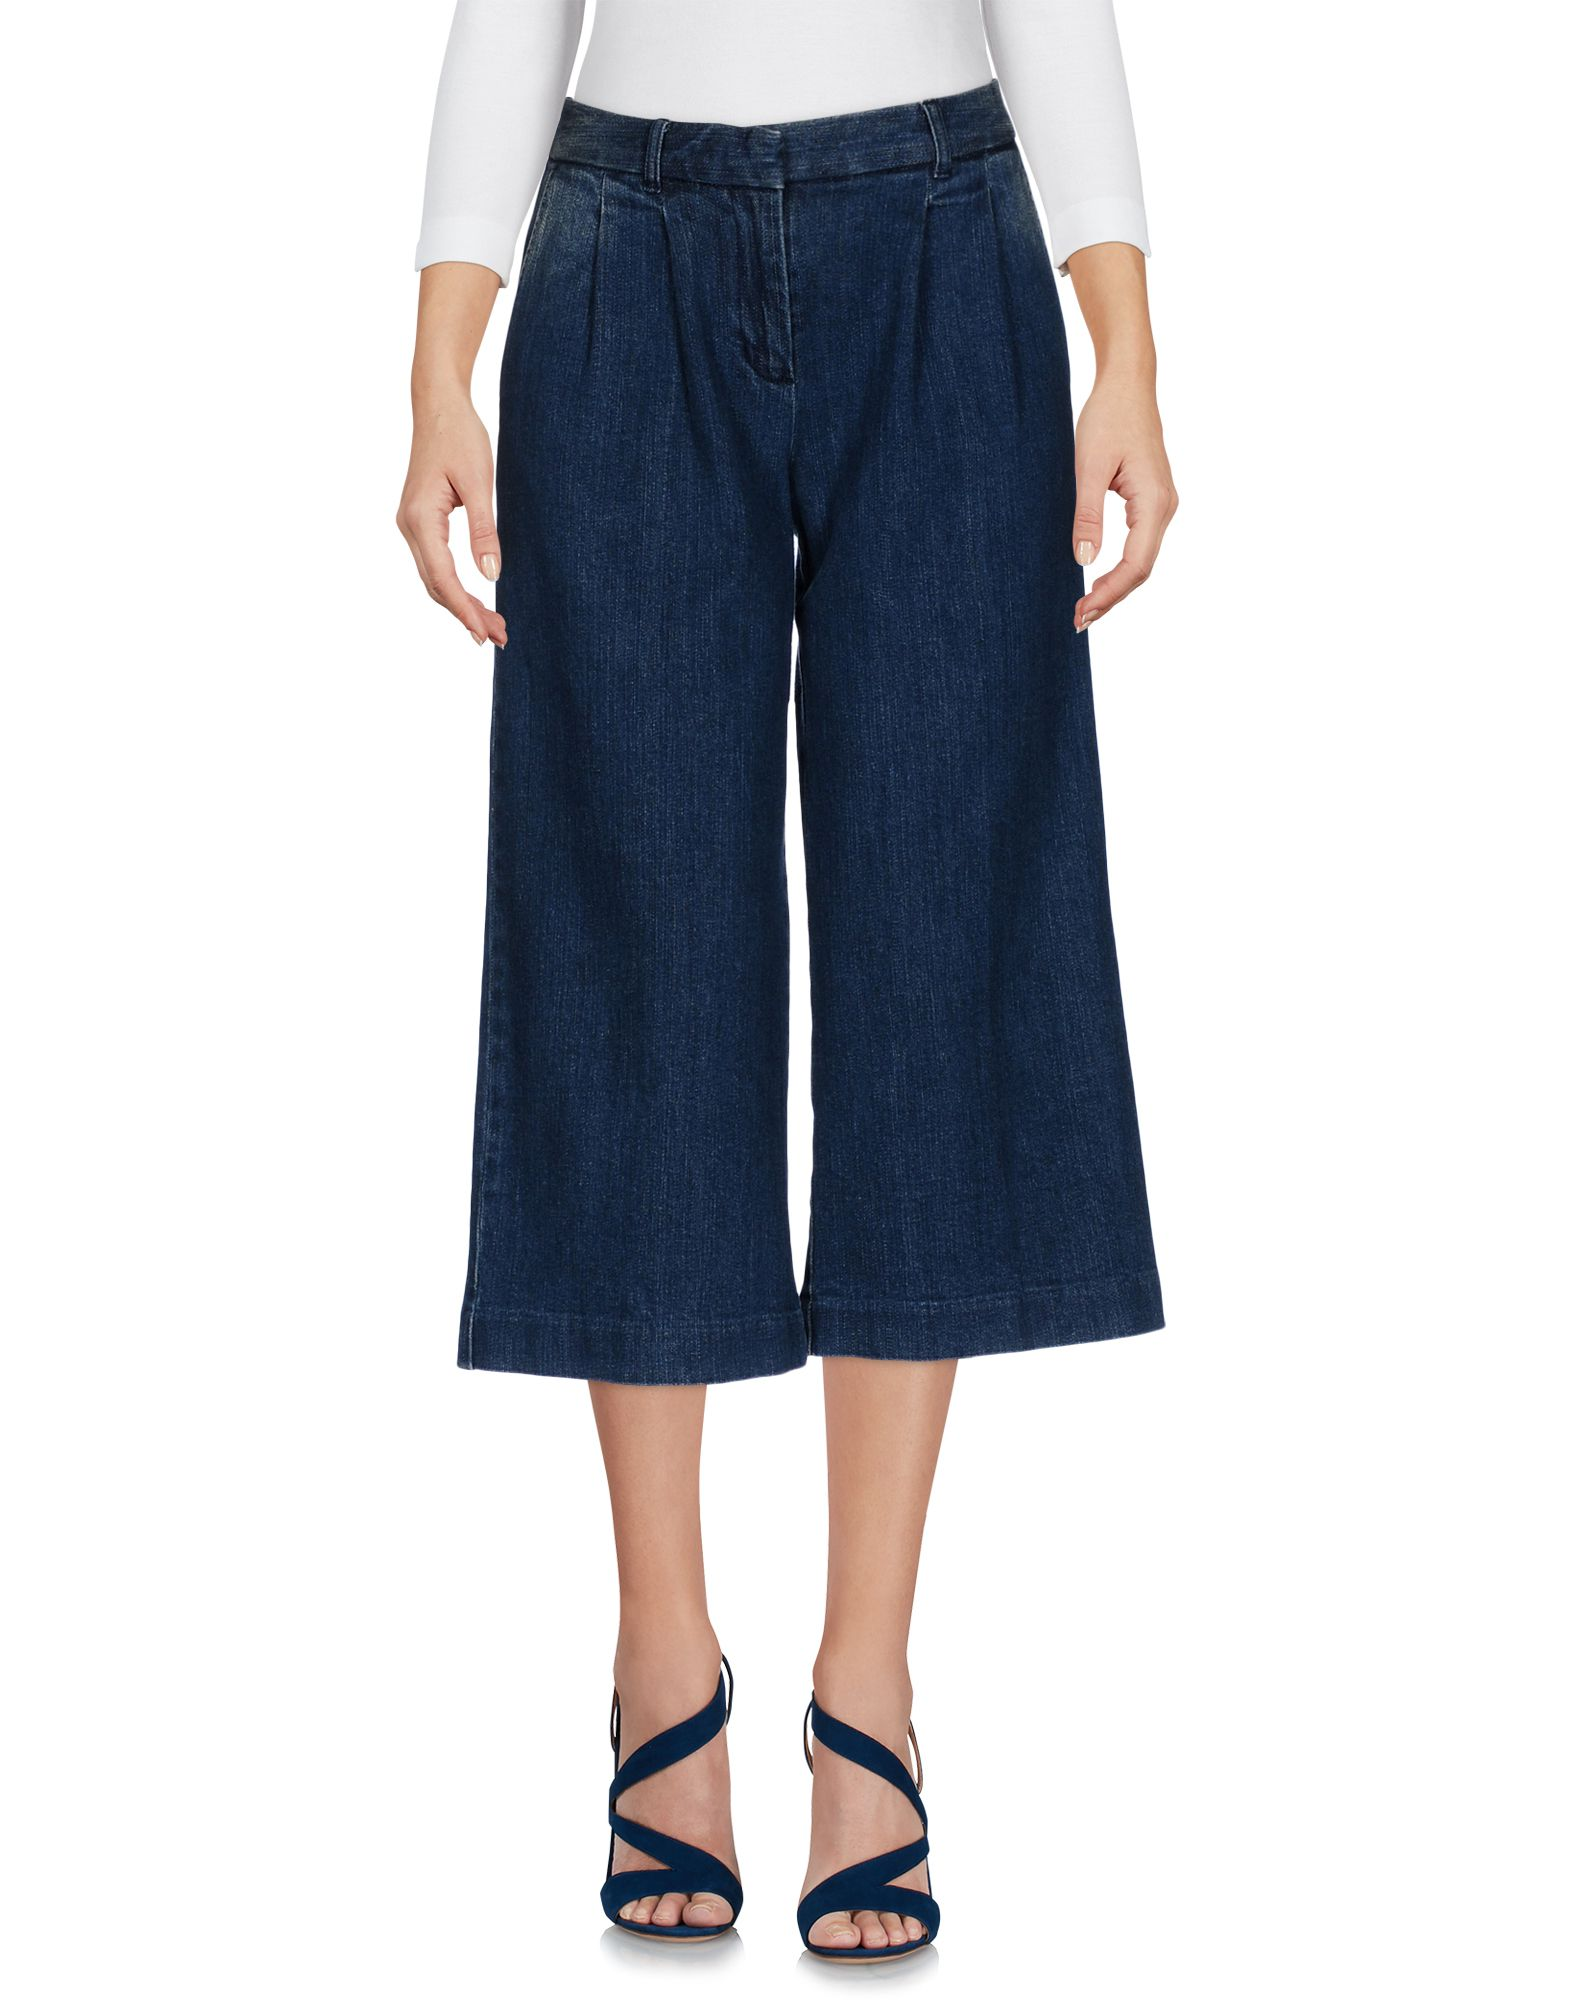 MICHAEL KORS Damen Caprijeans Farbe Blau Größe 5 jetztbilligerkaufen